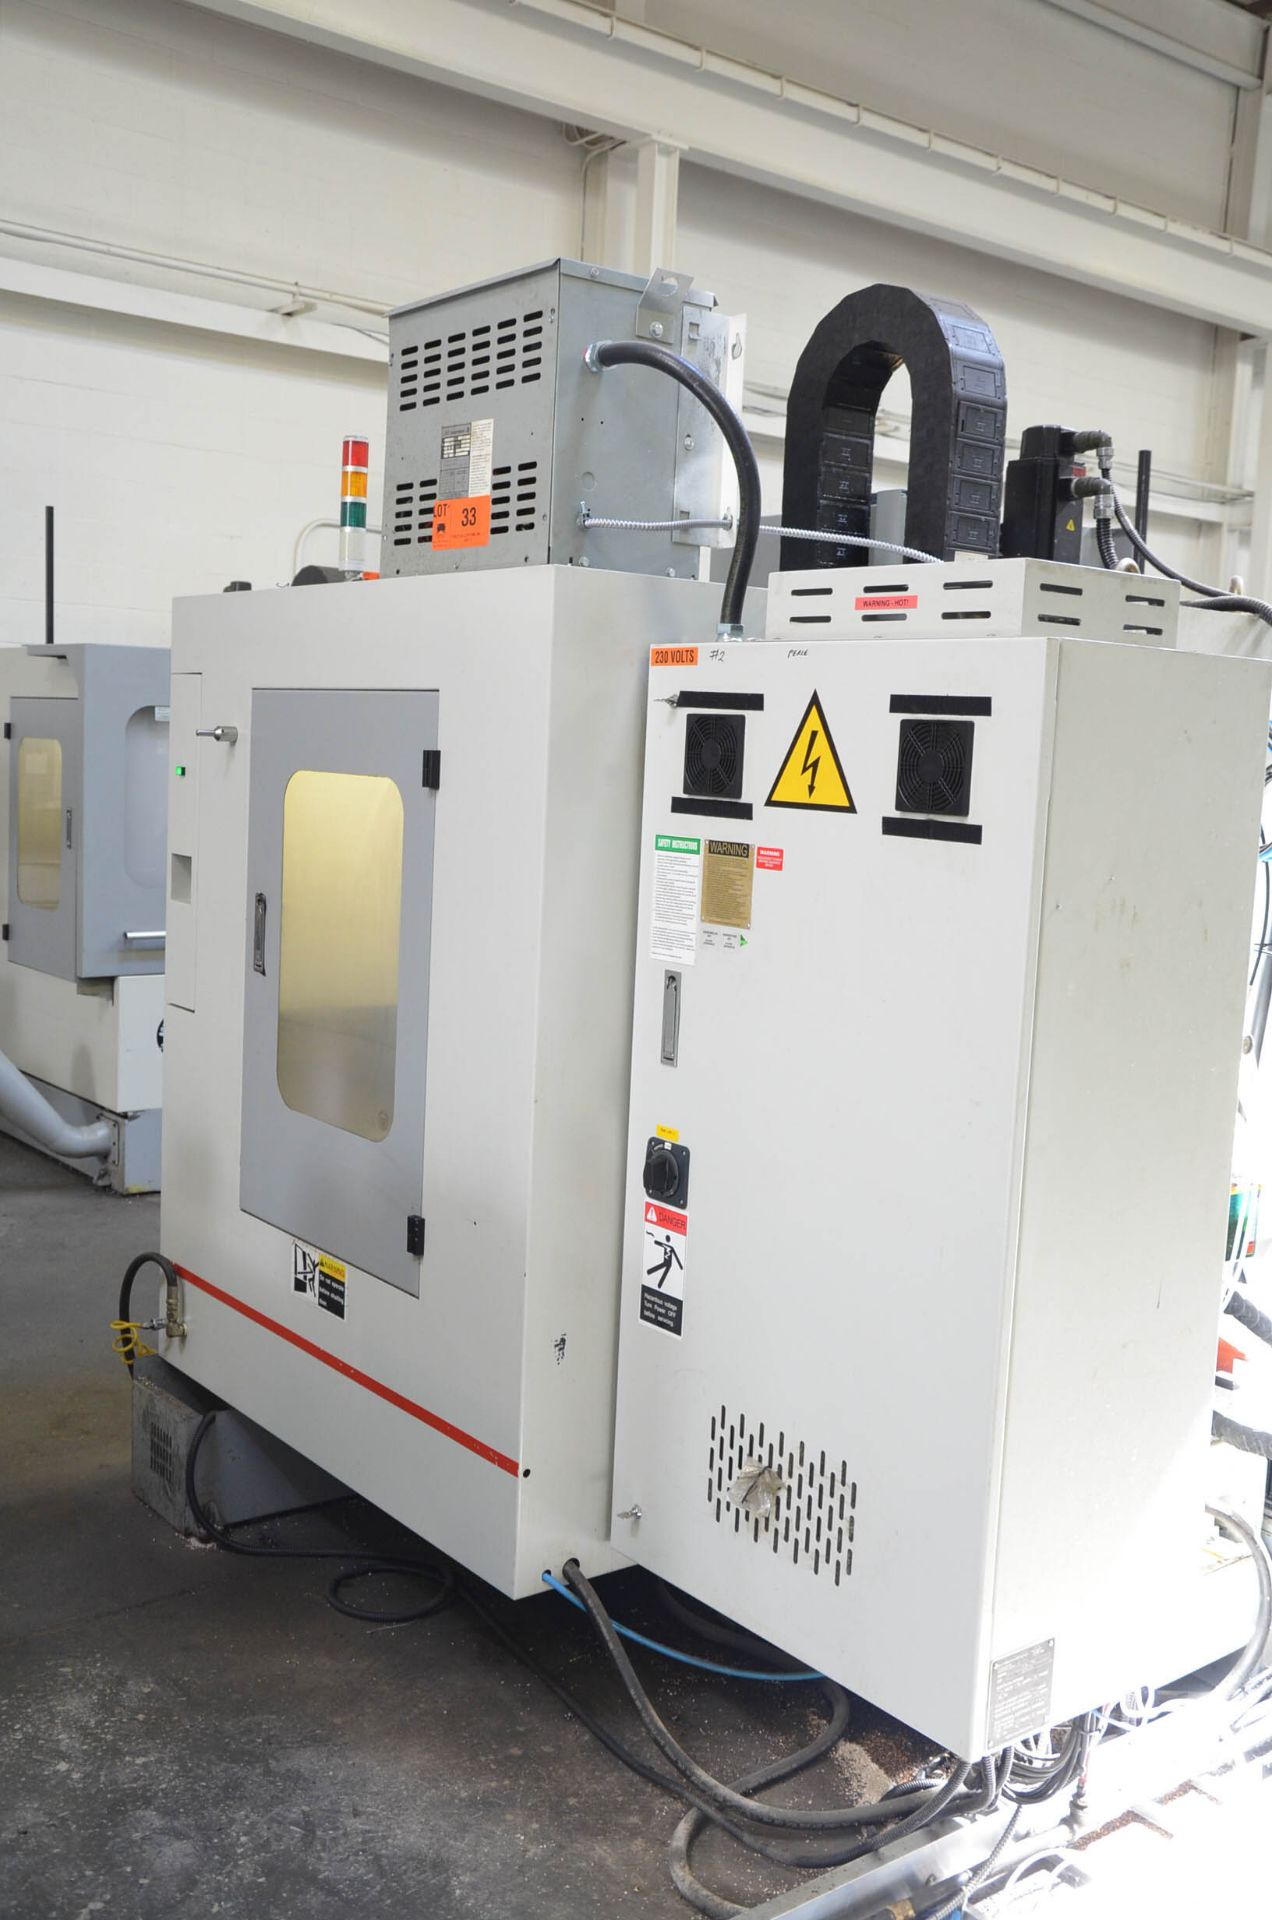 SWI (2014) TRAK LPM 4-AXIS READY CNC VERTICAL MACHINING CENTER WITH PROTO TRAK PMX CNC CONTROL, 19. - Image 4 of 12